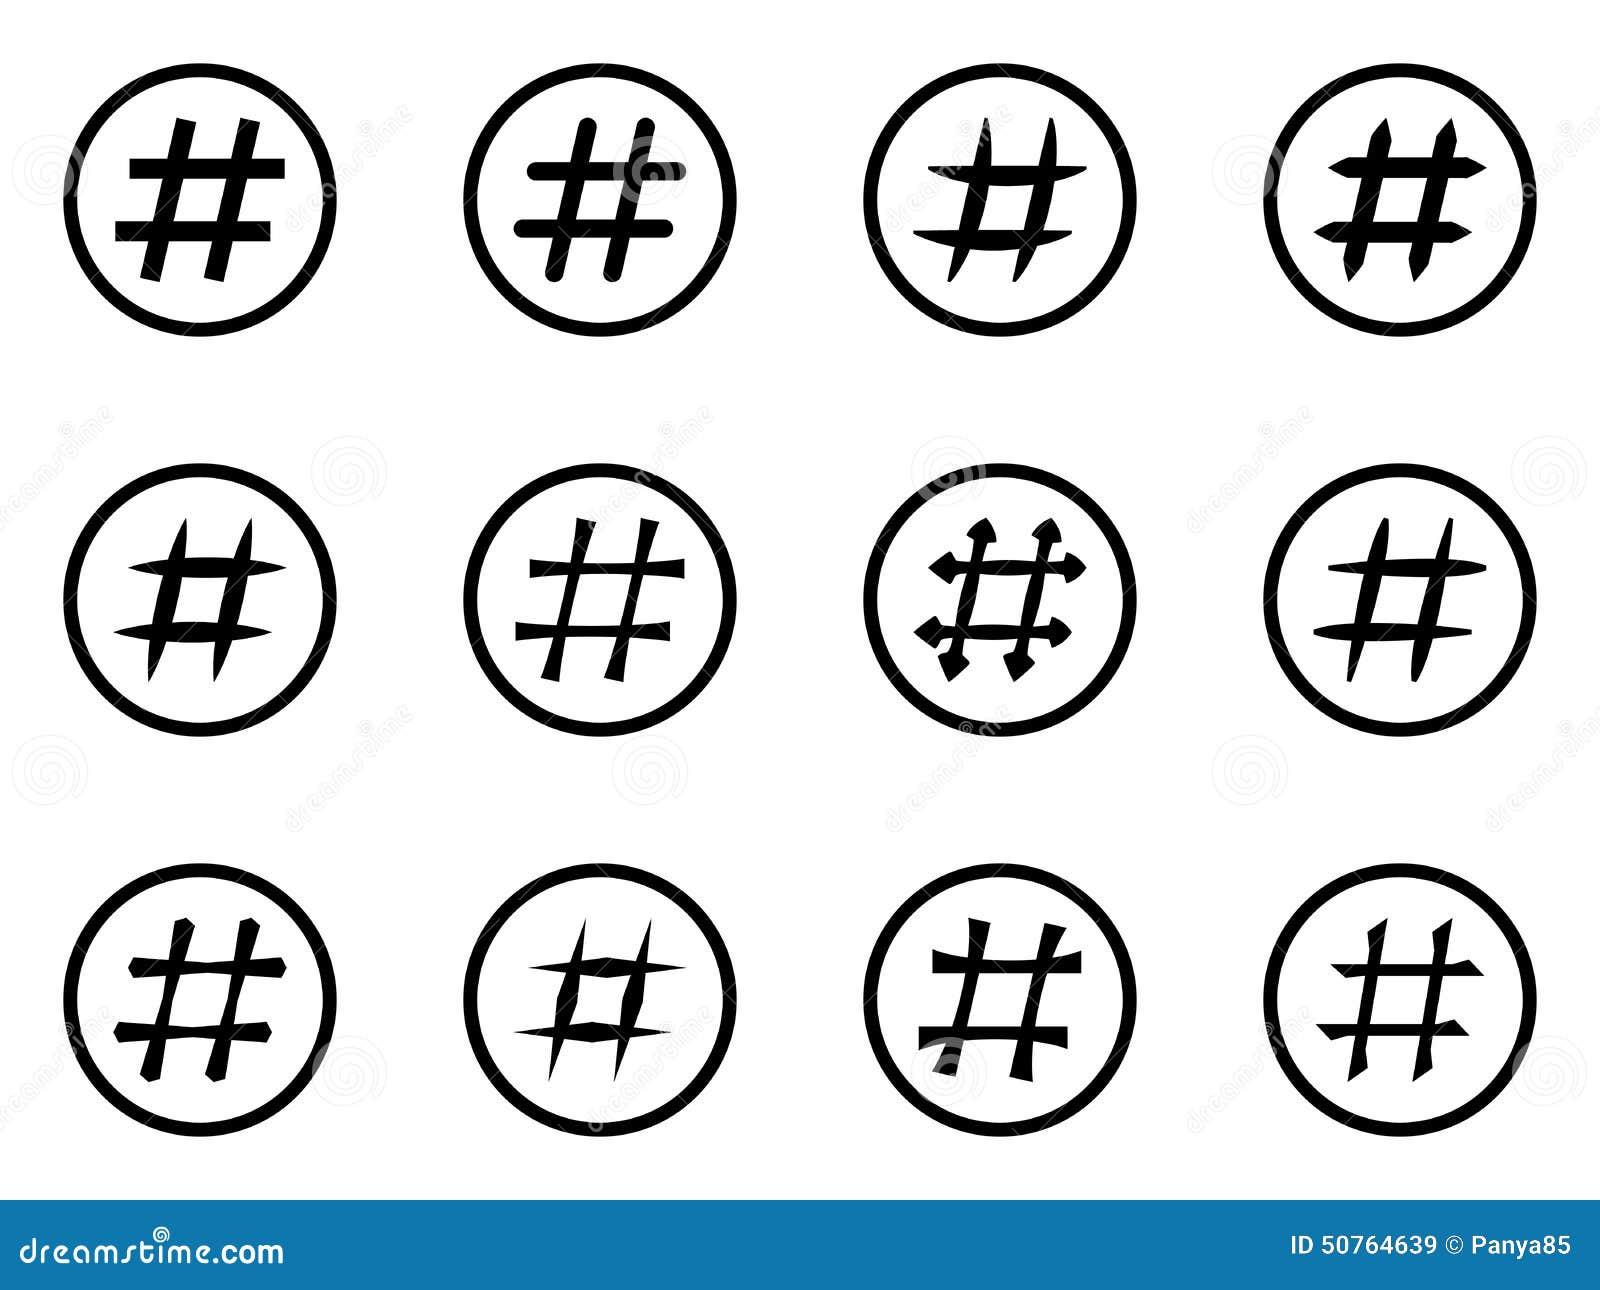 Hashtag #Dangl on Instagram